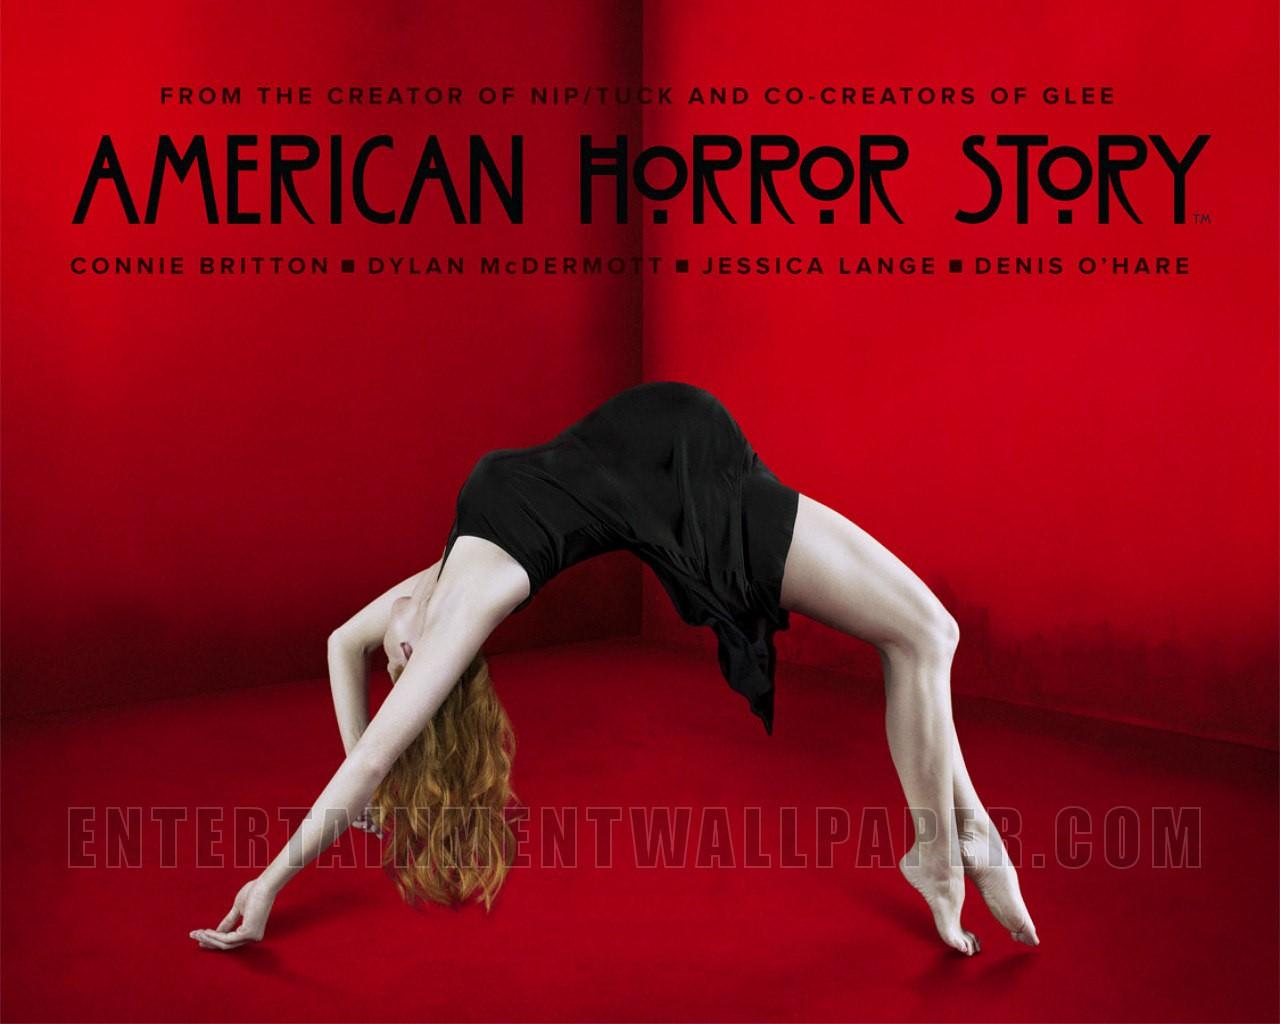 American horror story wallpaper american horror story - Ahs wallpaper ...